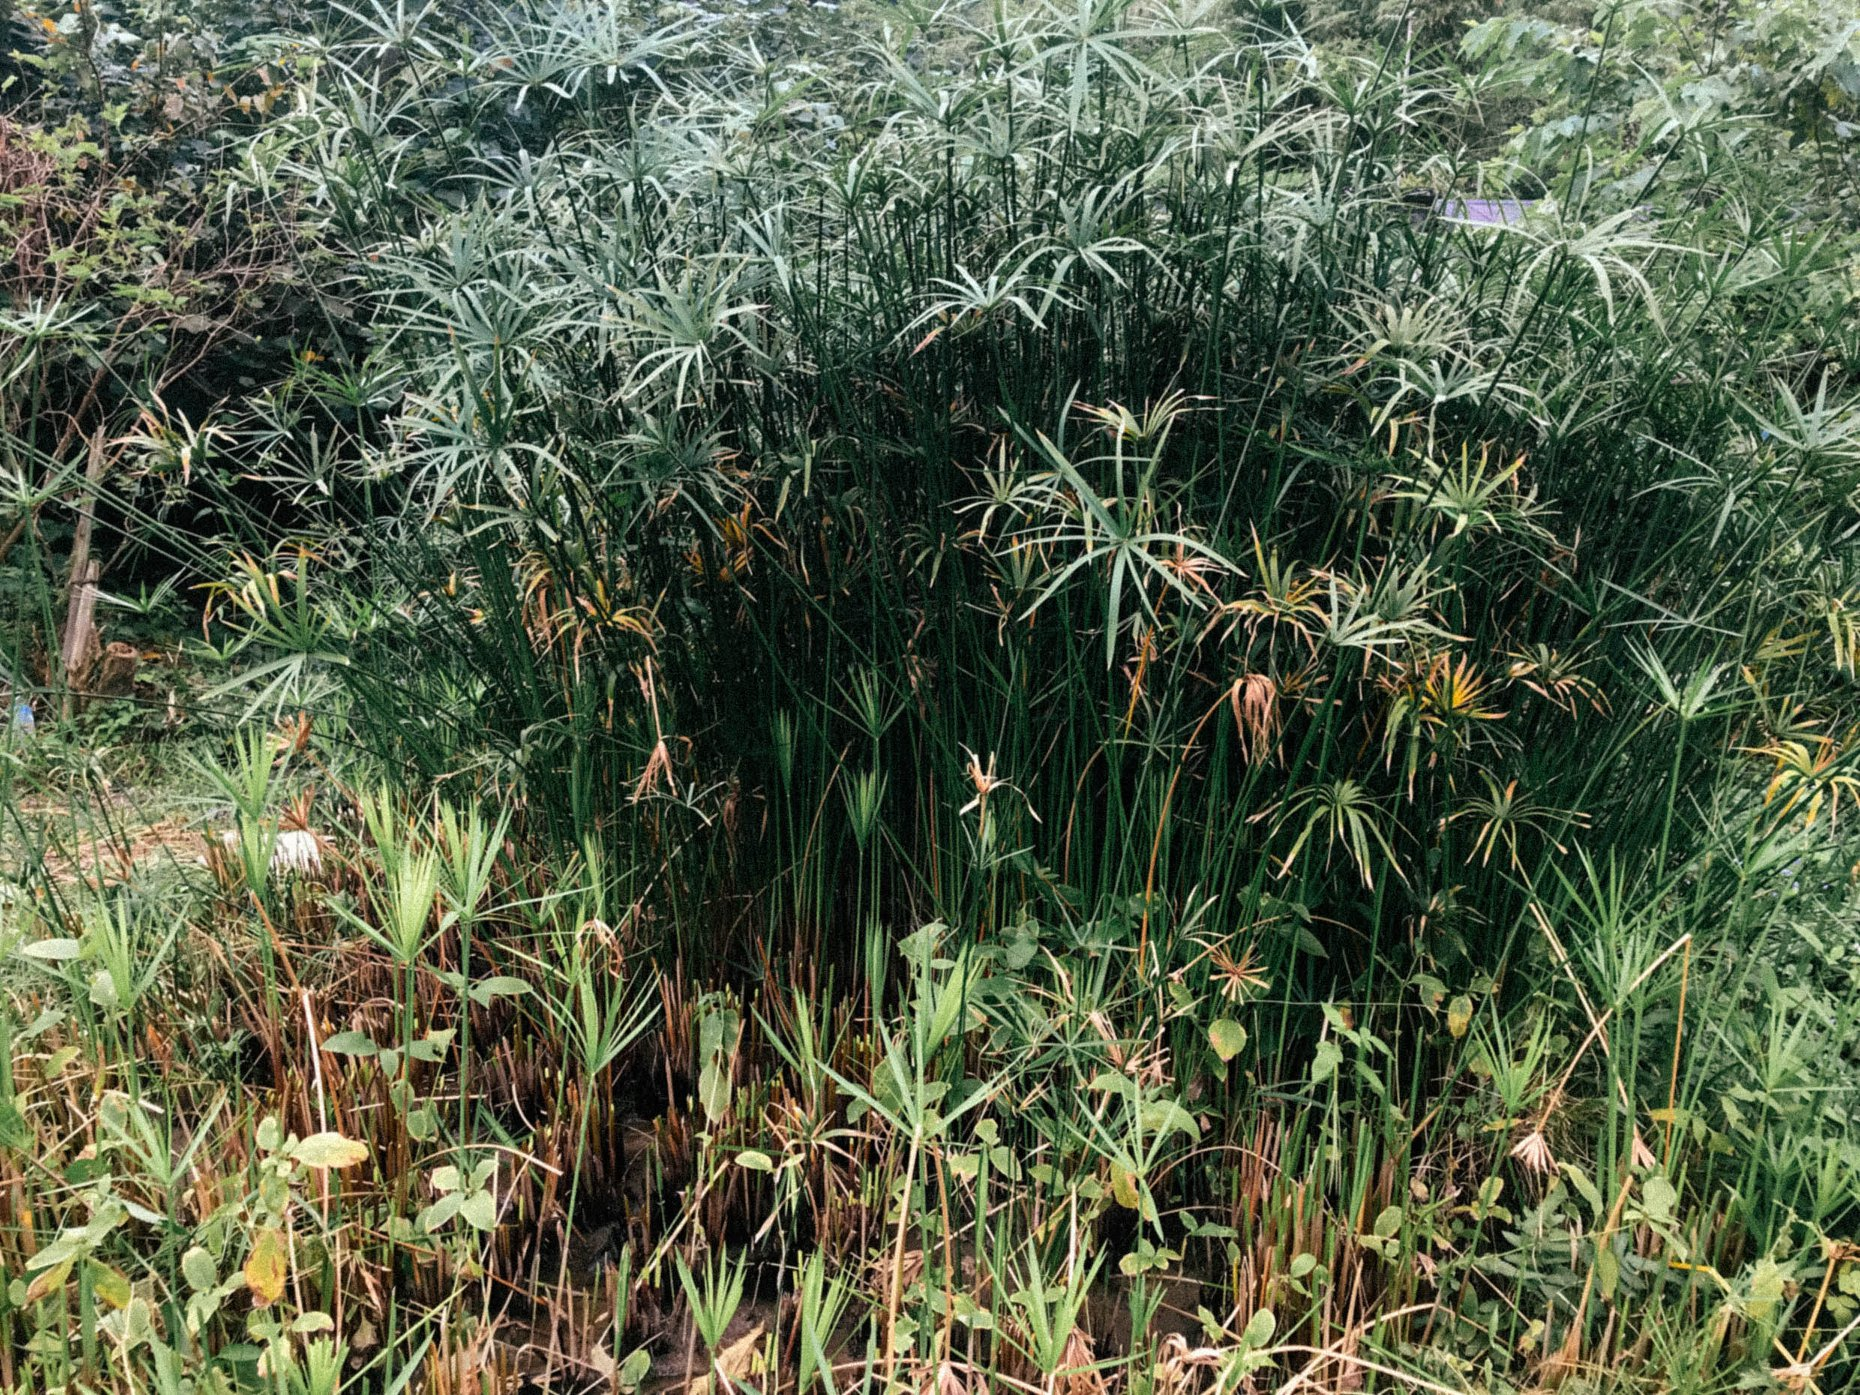 Arik: 最困難的是在砍輪傘草遇到其他植物糾纏的時候。因為其實田裡不只有輪傘草還有其他植物像小花蔓澤蘭就會纏繞在輪傘草上,如果不小心就會折斷輪傘草,就會損失一部分的草量。  最難忘的是,連夜趕著剖草然後隔天一早56點起床砍草,下午再去一趟。連續著幾天過著很充實的部落婦女生活!